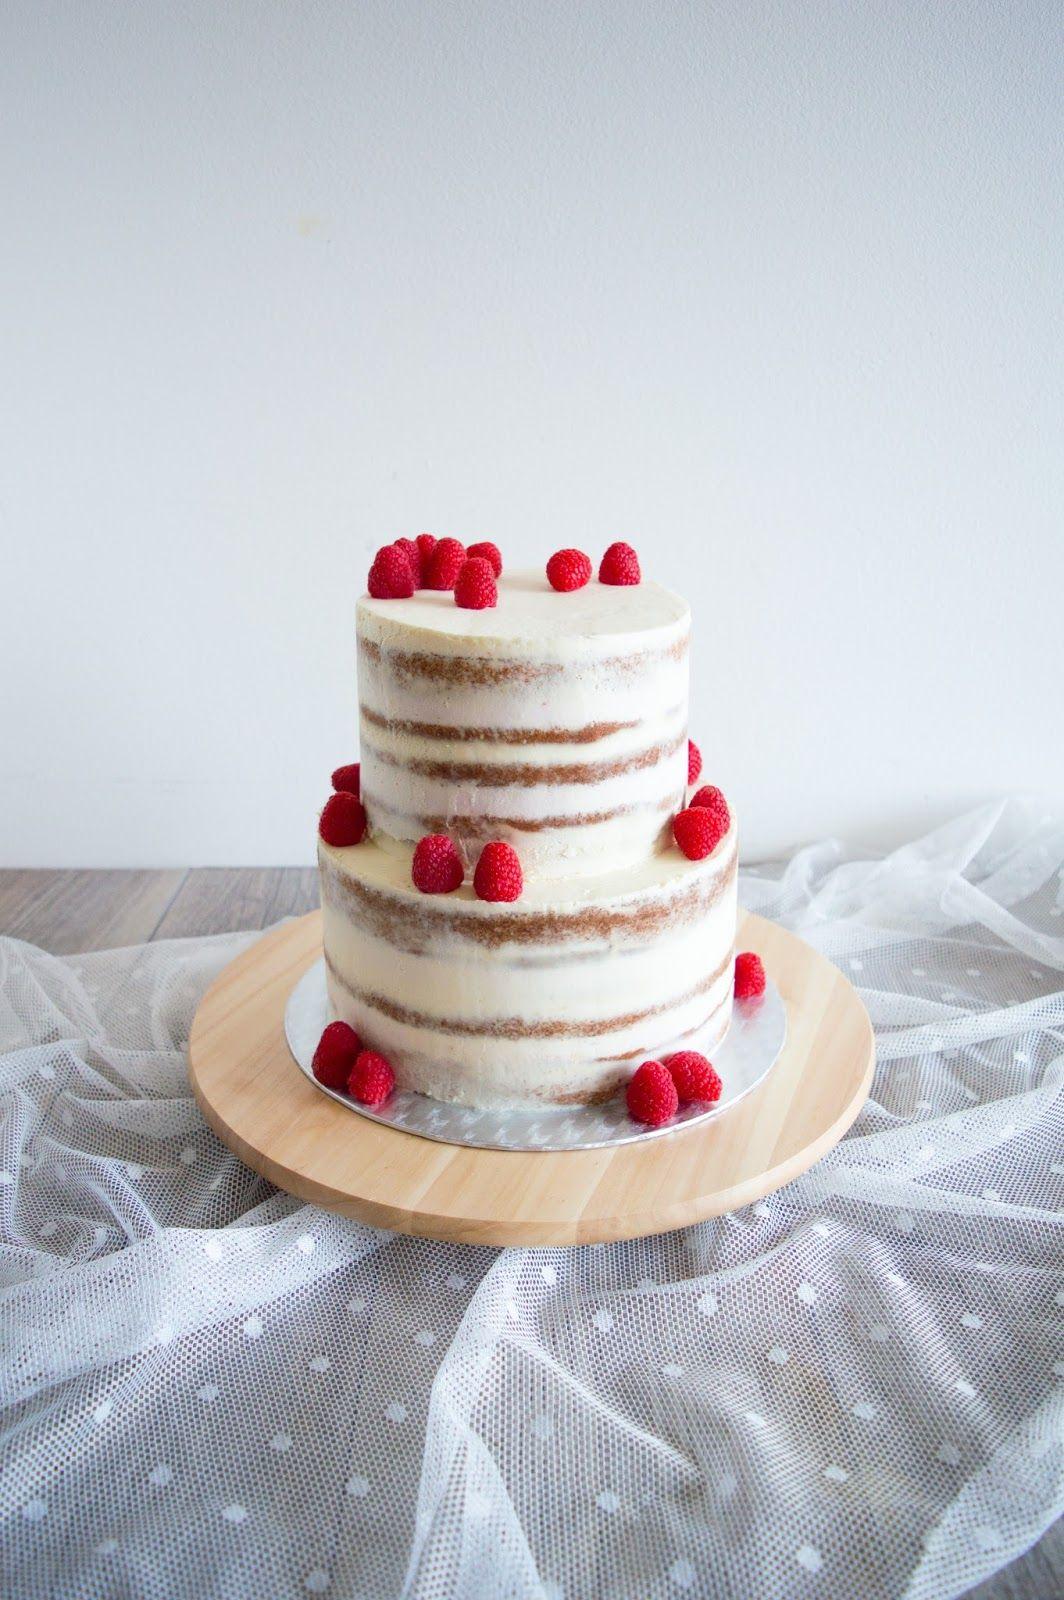 Dvoupatrový mandlový dort s Amarettem a malinovým krémem s likérem Crème de Cassis/Almond and Amaretto wedding cake with raspberry and Crème de Cassis filling